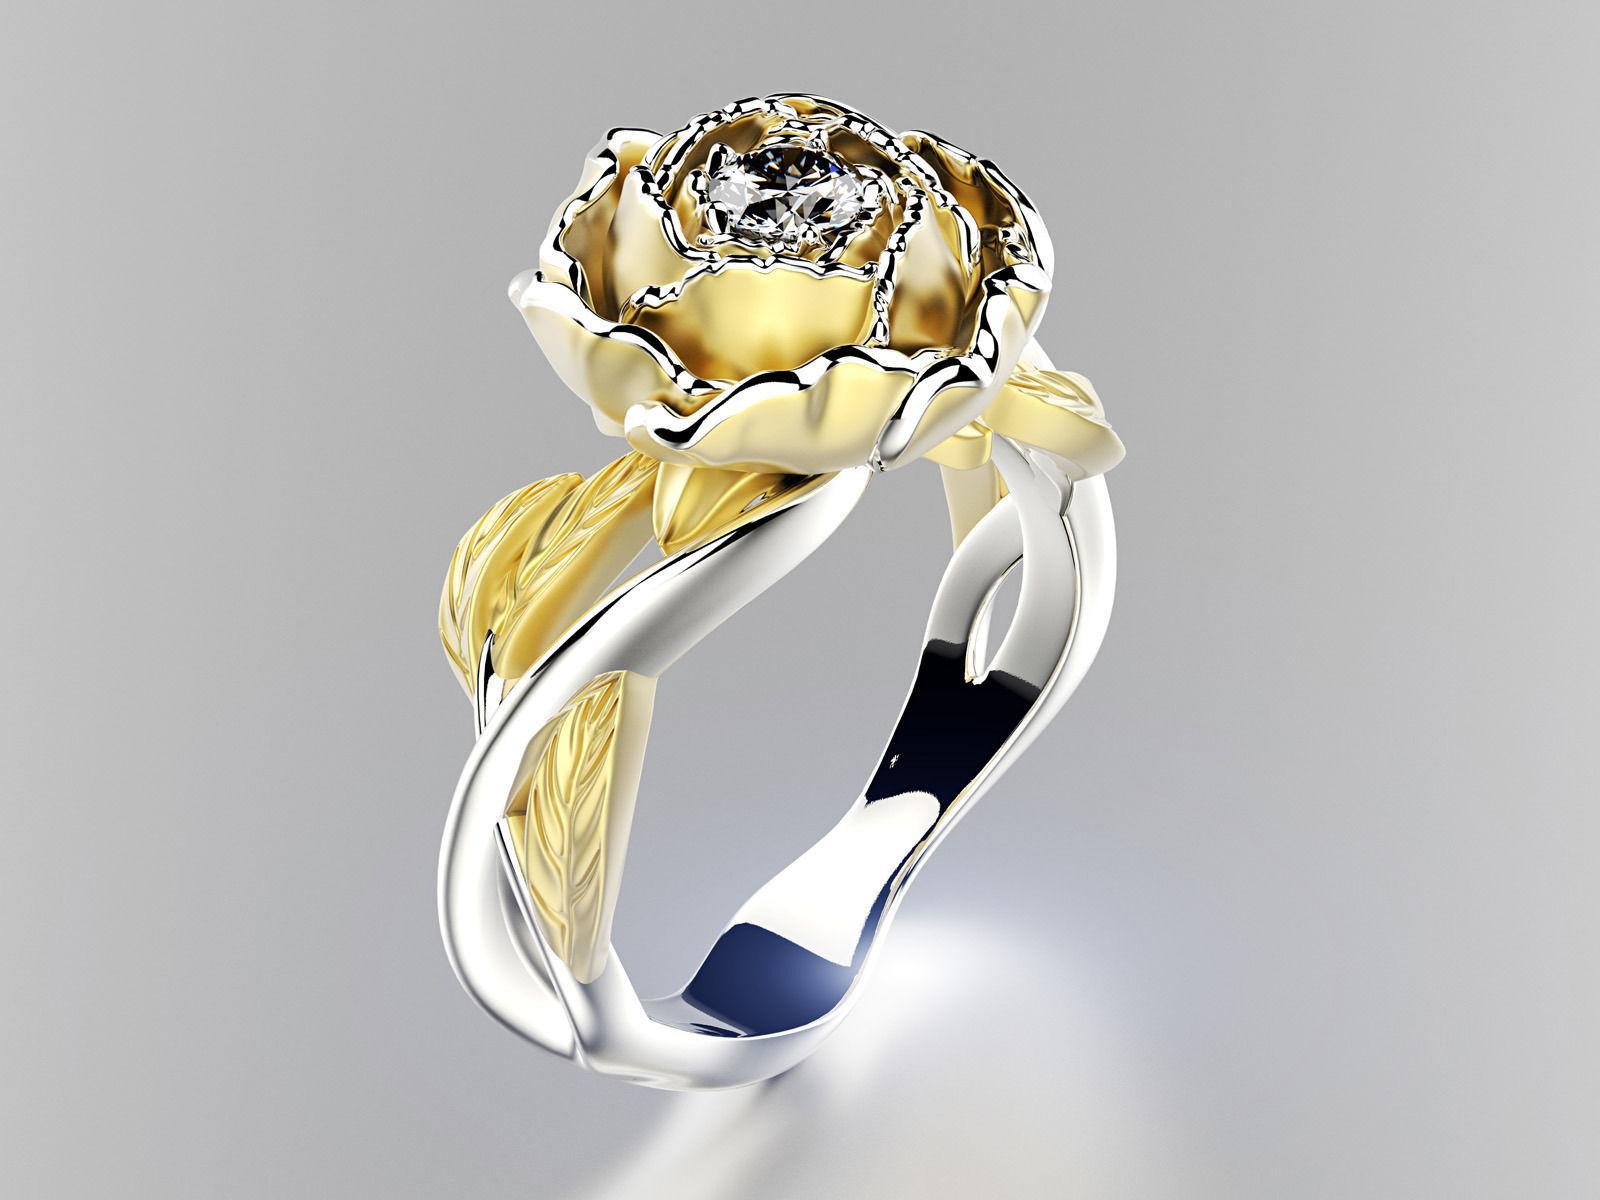 Peony Fashion Ring 0004 3d Model 3d Printable Obj Fbx Ma